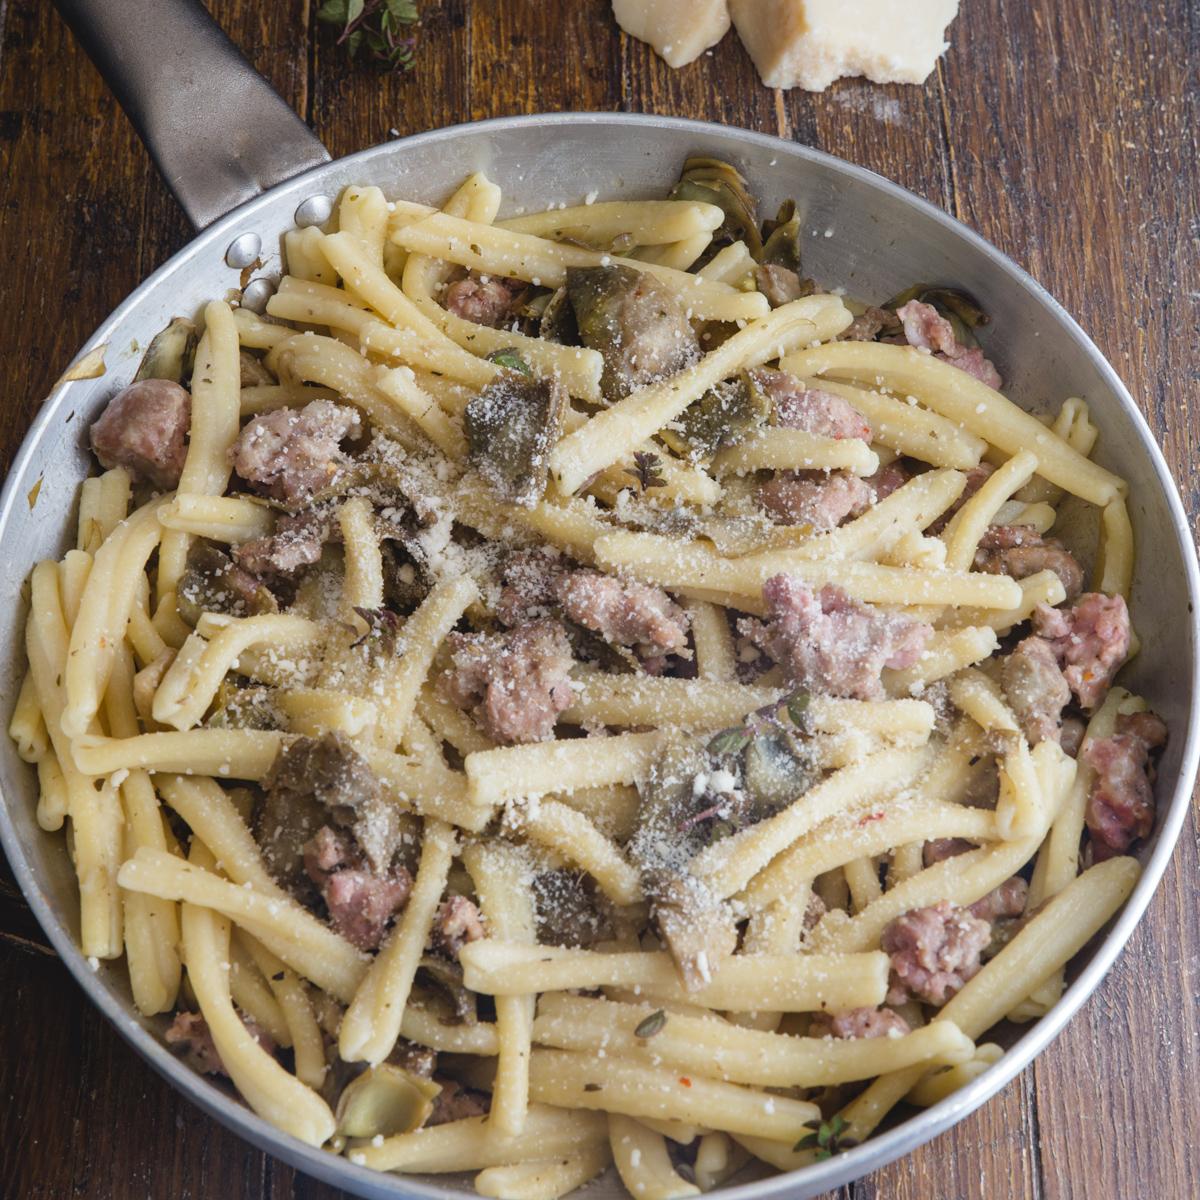 artichoke & sausage pasta in a silver pan.